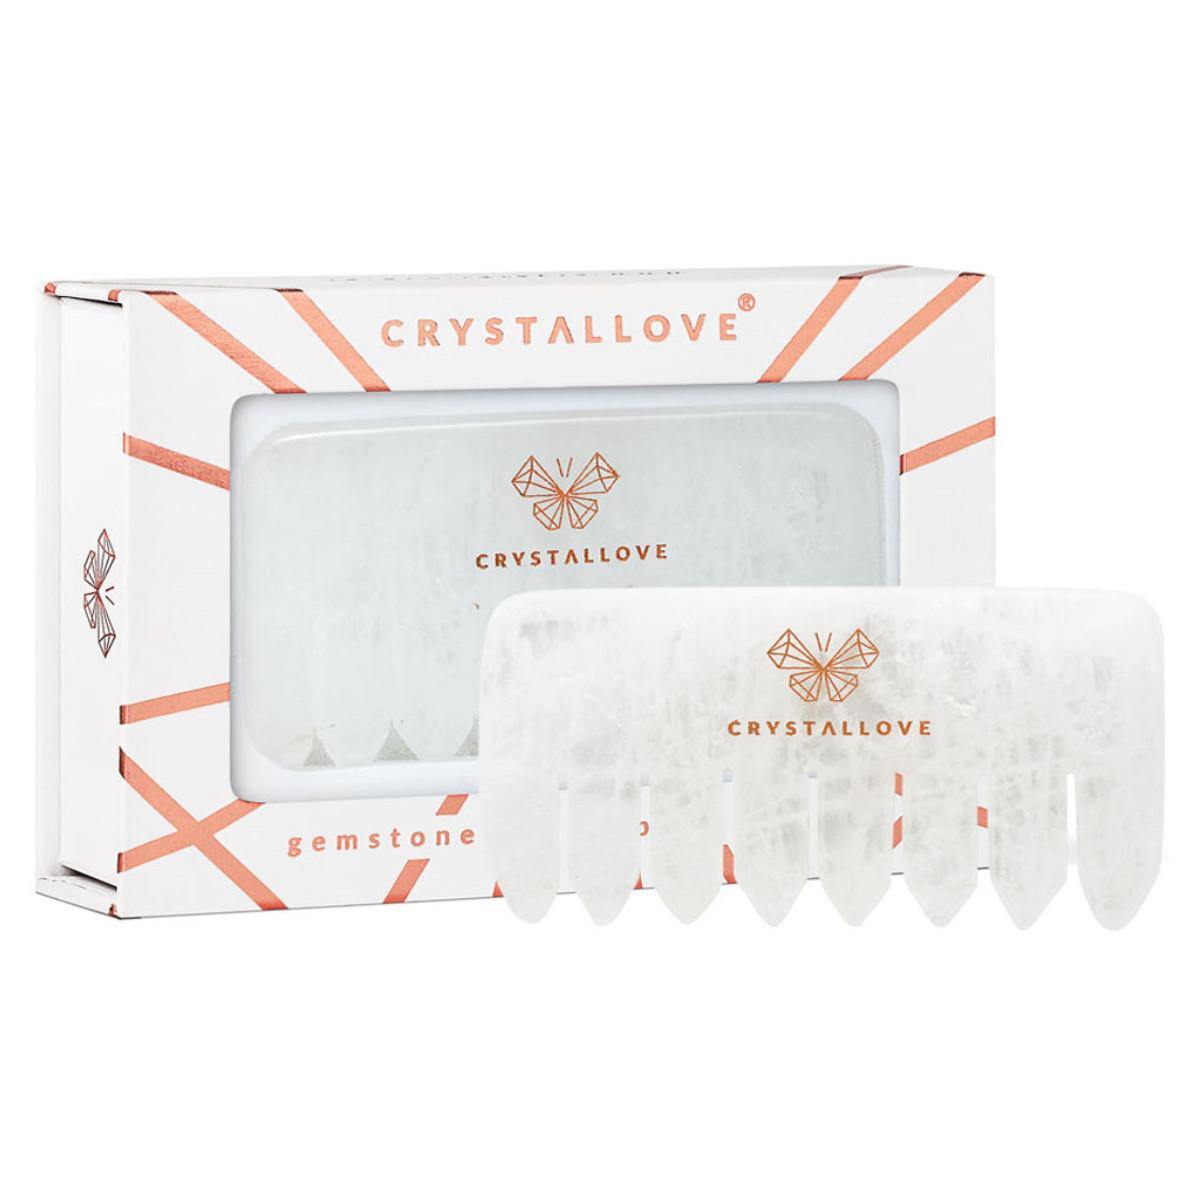 Crystallove Hřeben na vlasy, Clear quartz 1 ks